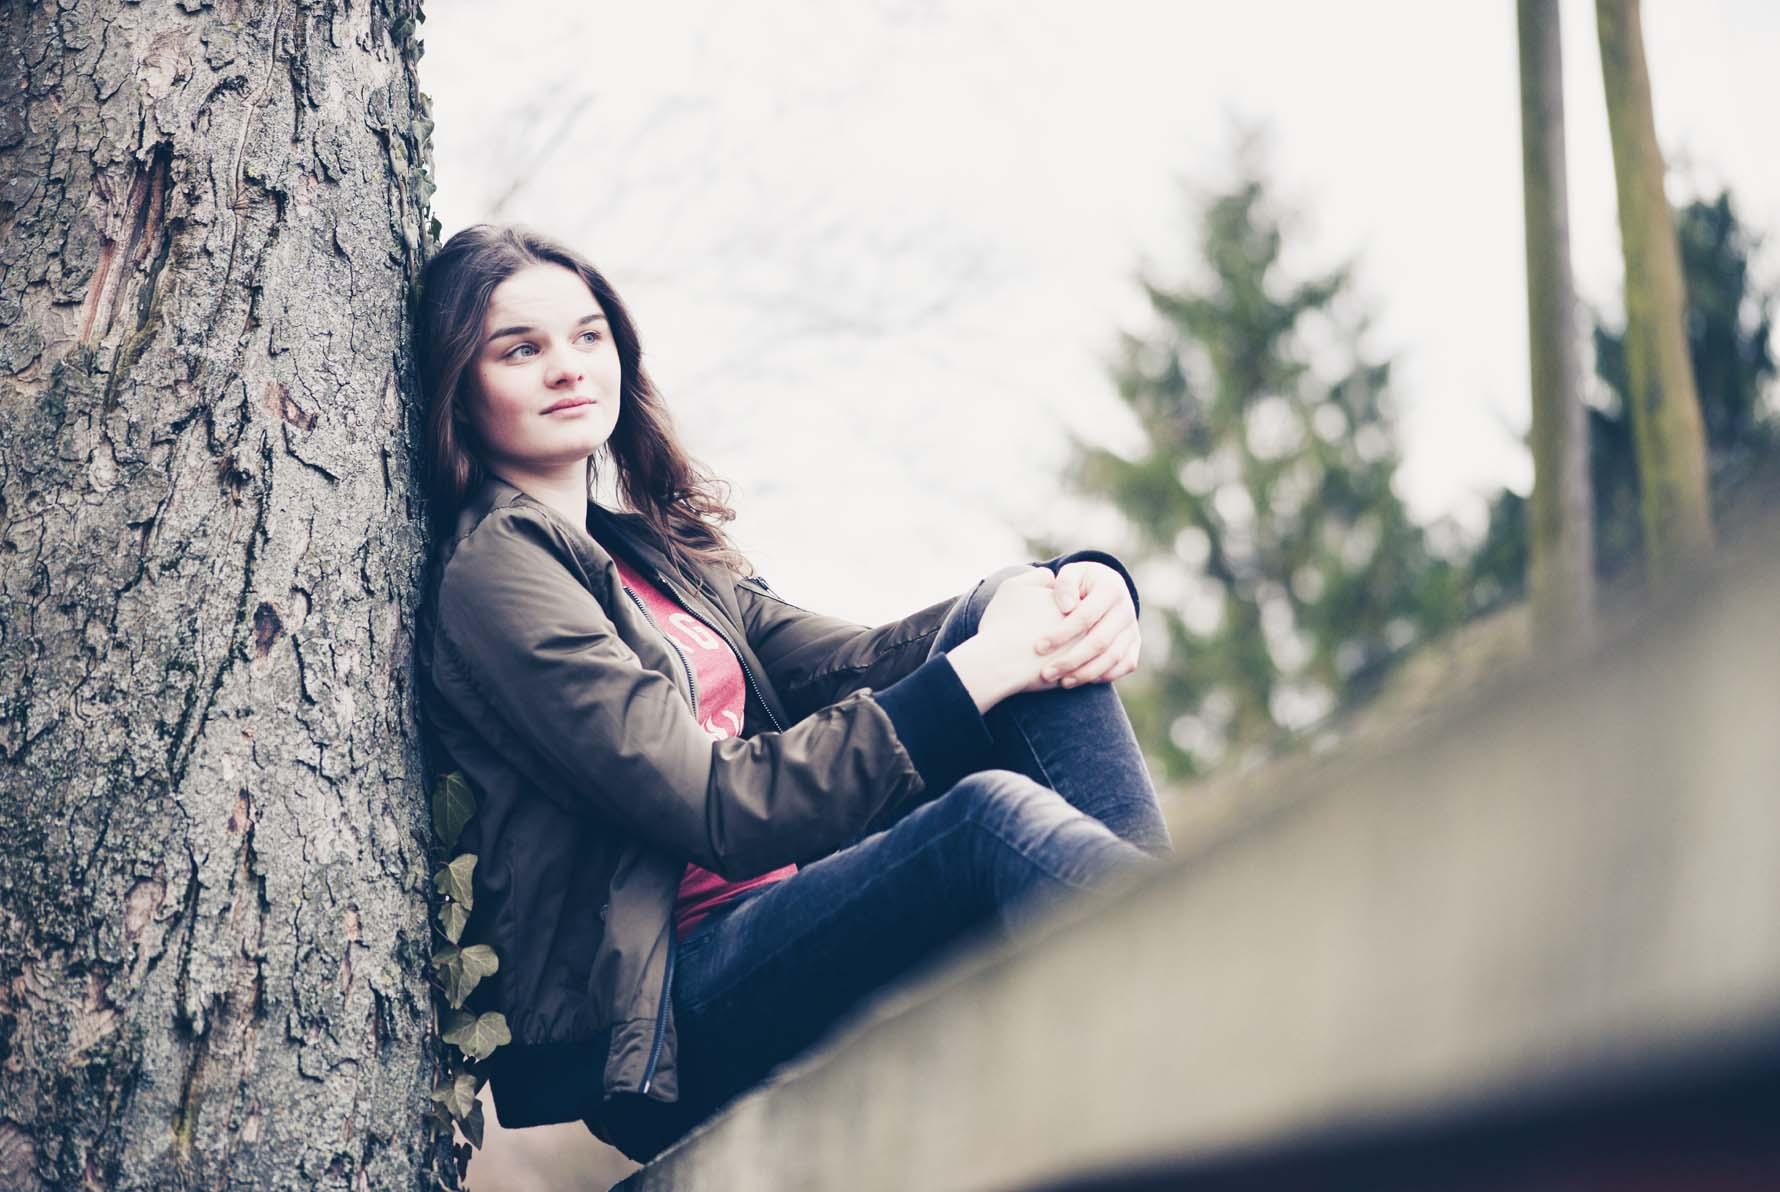 portraitfotos_siegen_028